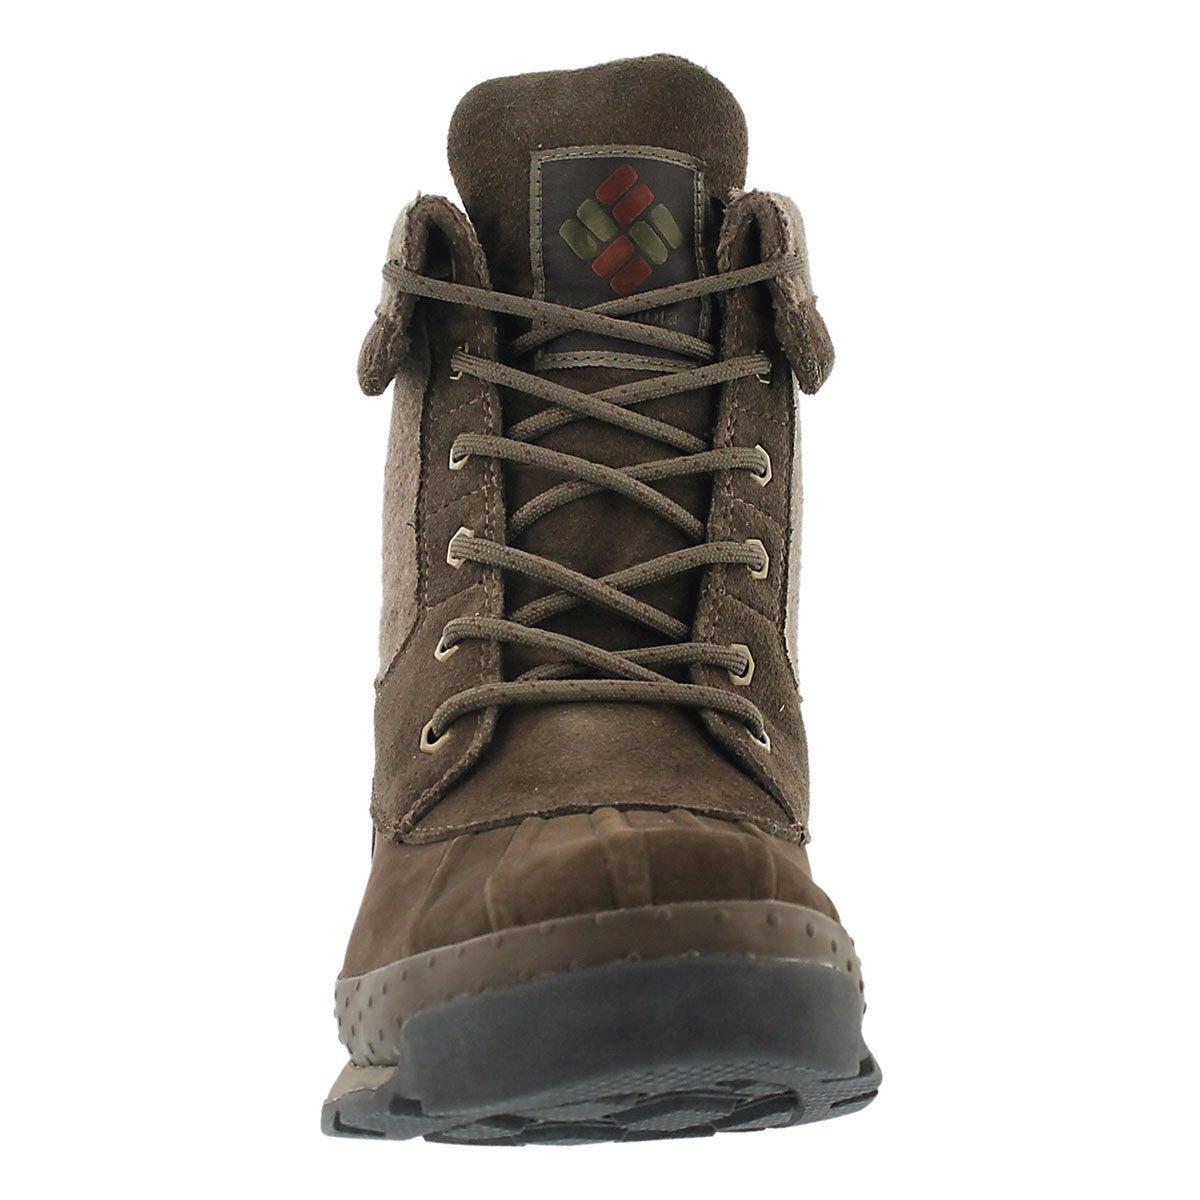 Mns Bugaboot Original Tall brn wntr boot